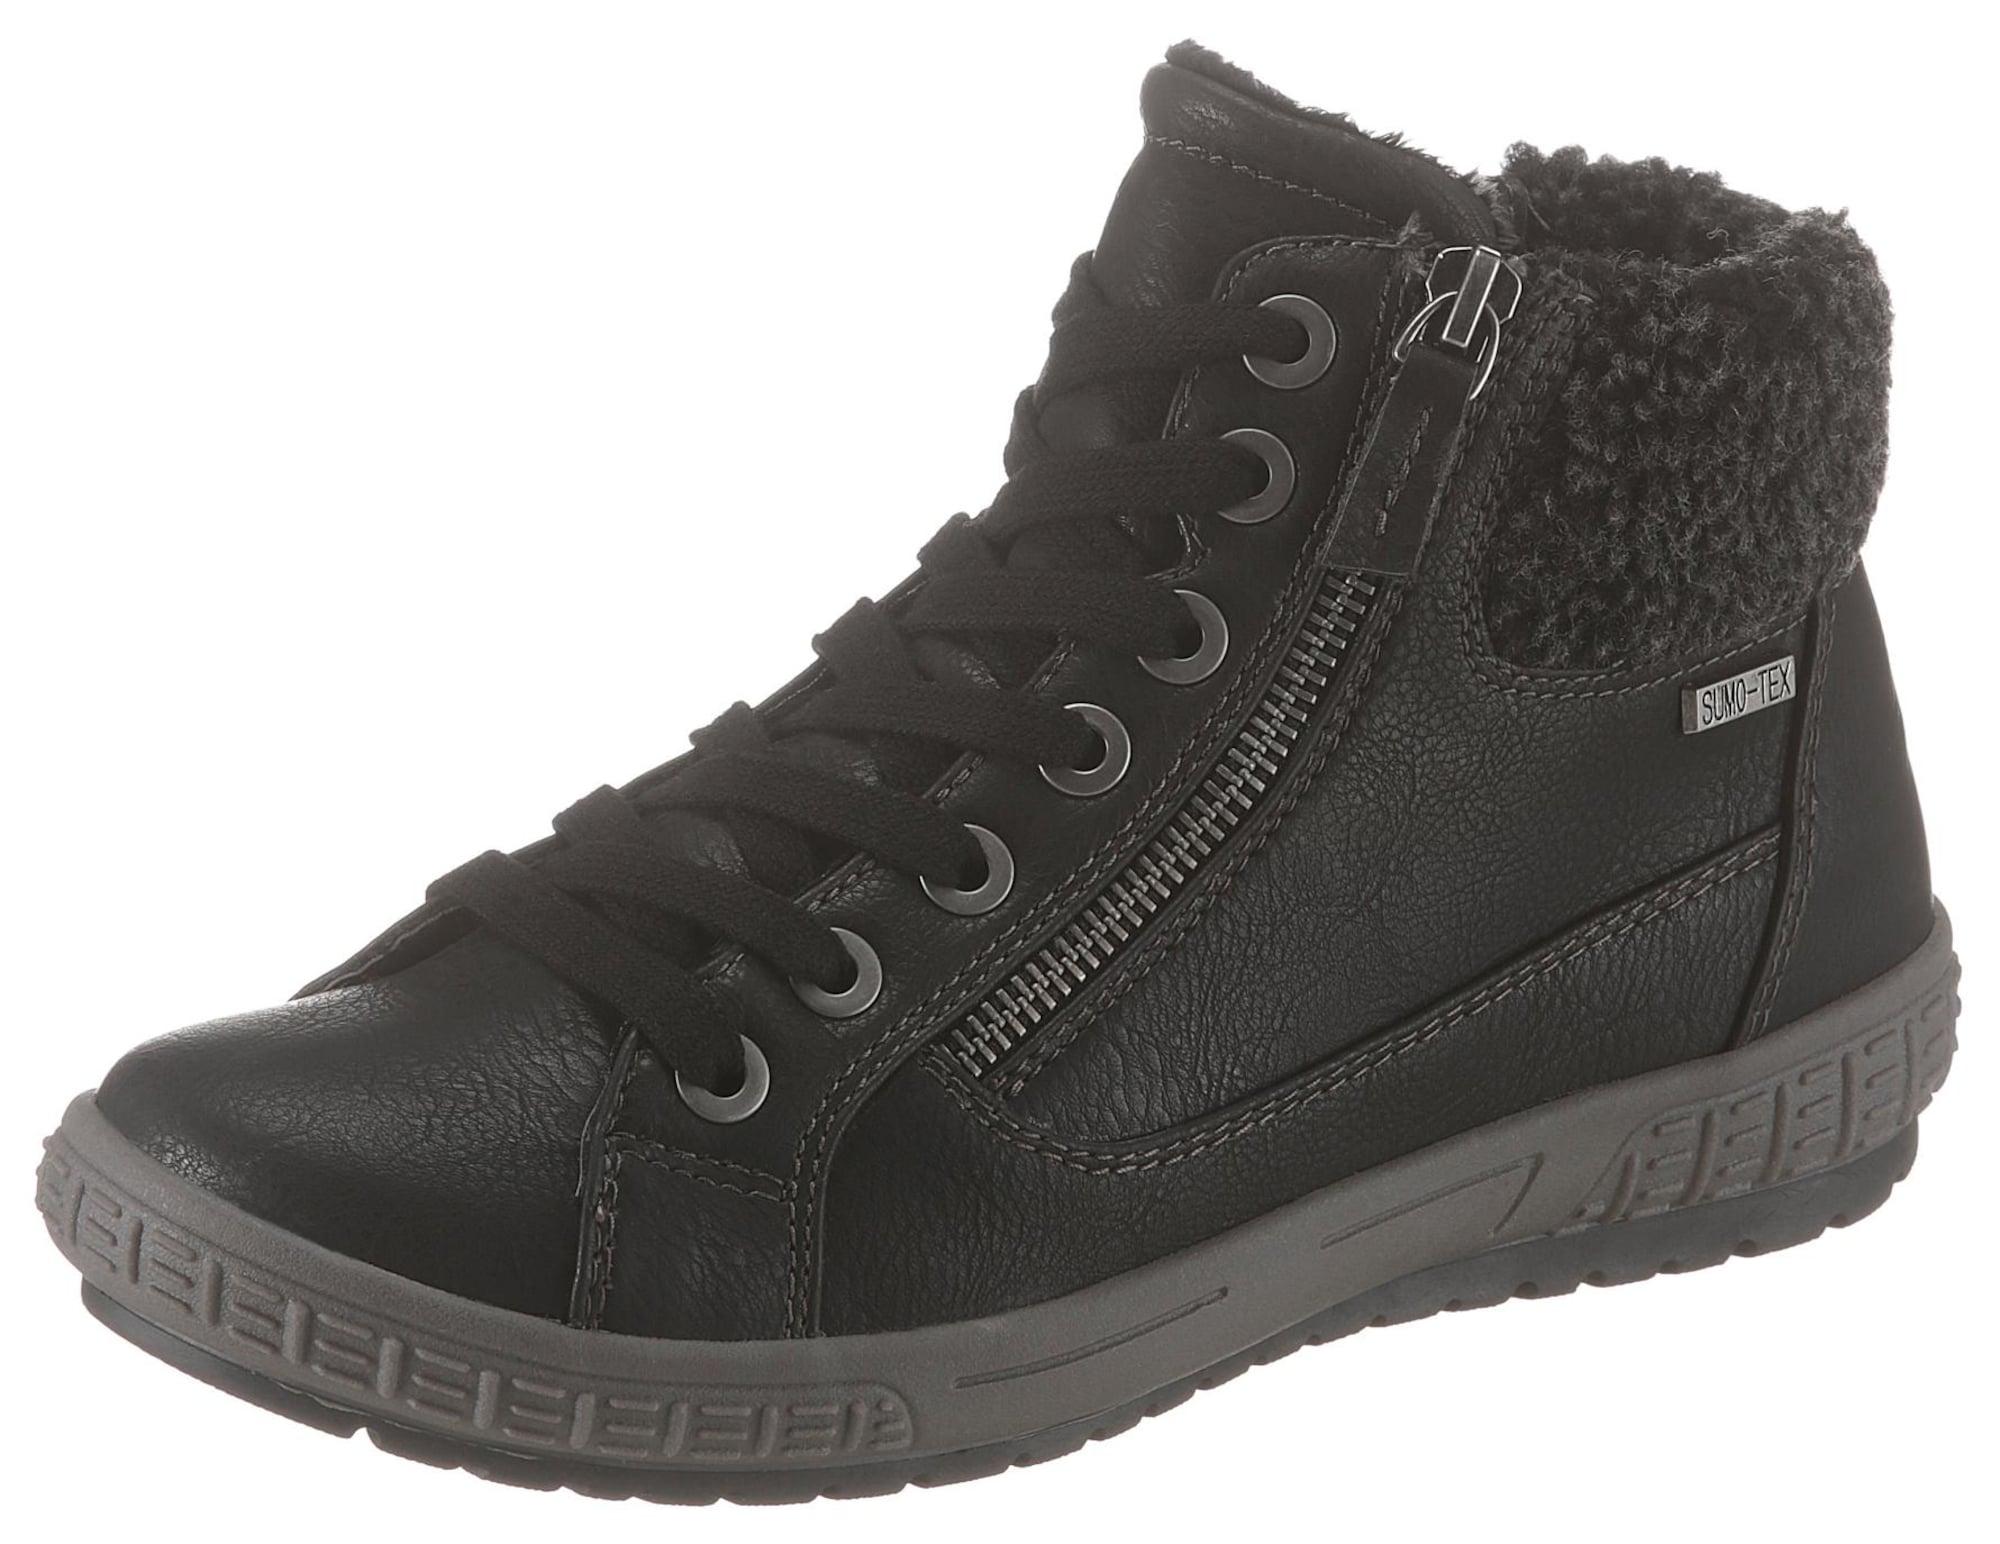 Winterboots | Schuhe > Boots > Winterboots | CITY WALK